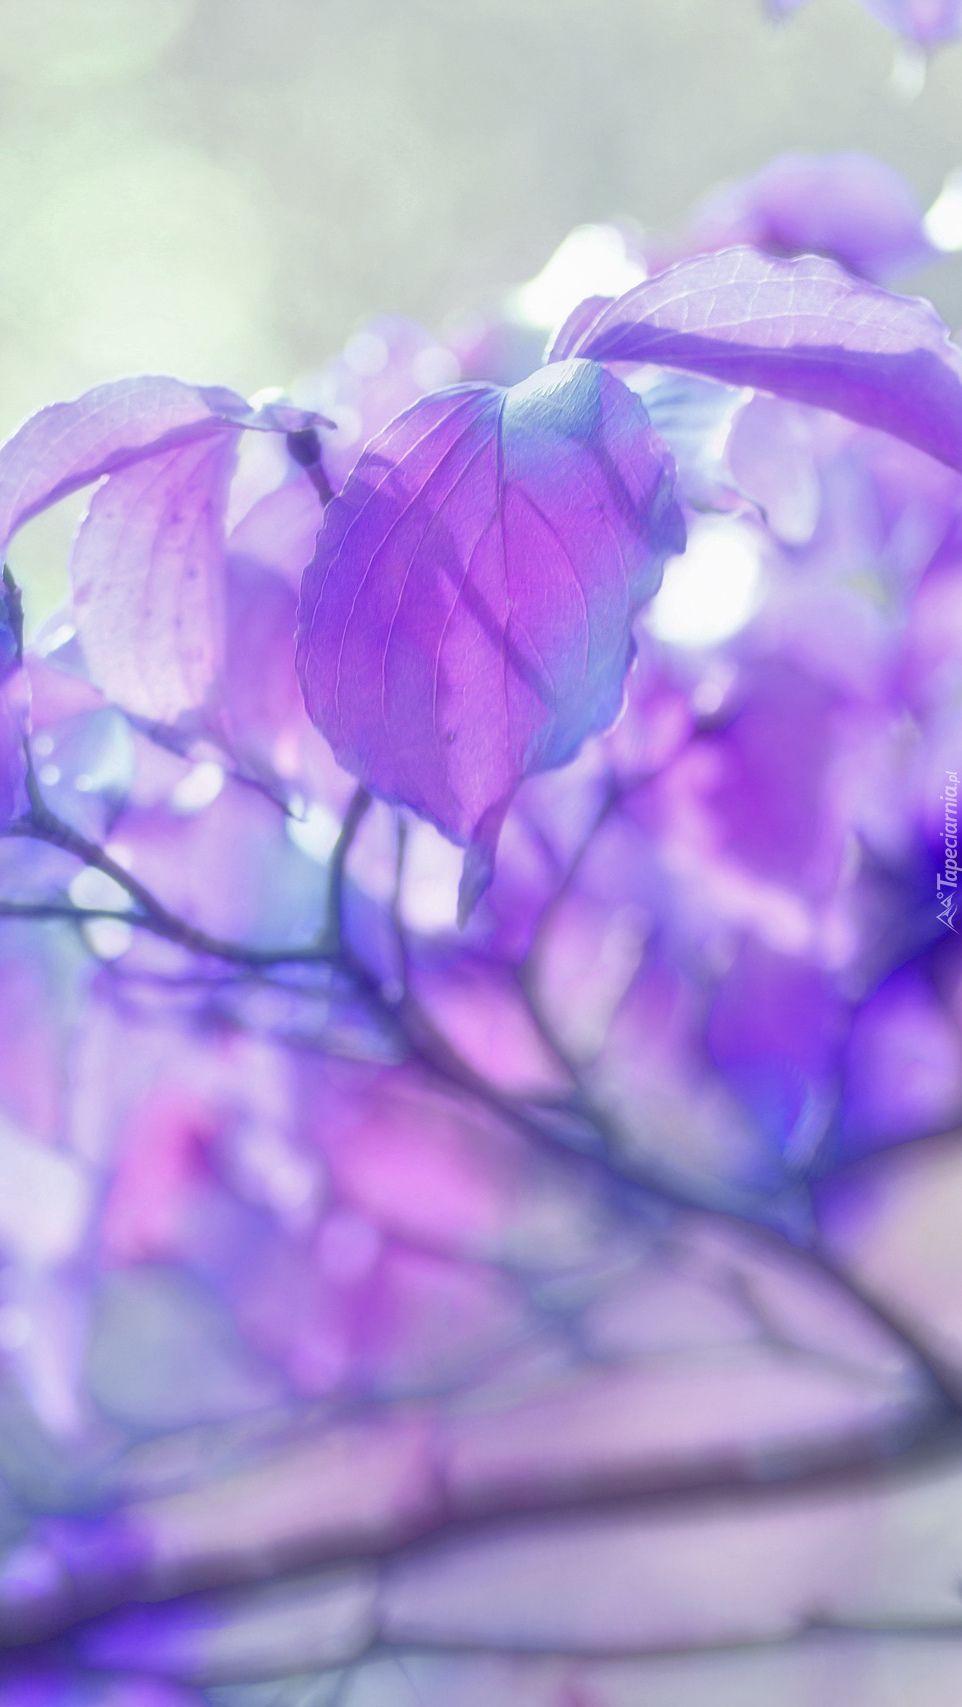 Fioletowe Liscie W Rozmyciu Haha Plants Purple